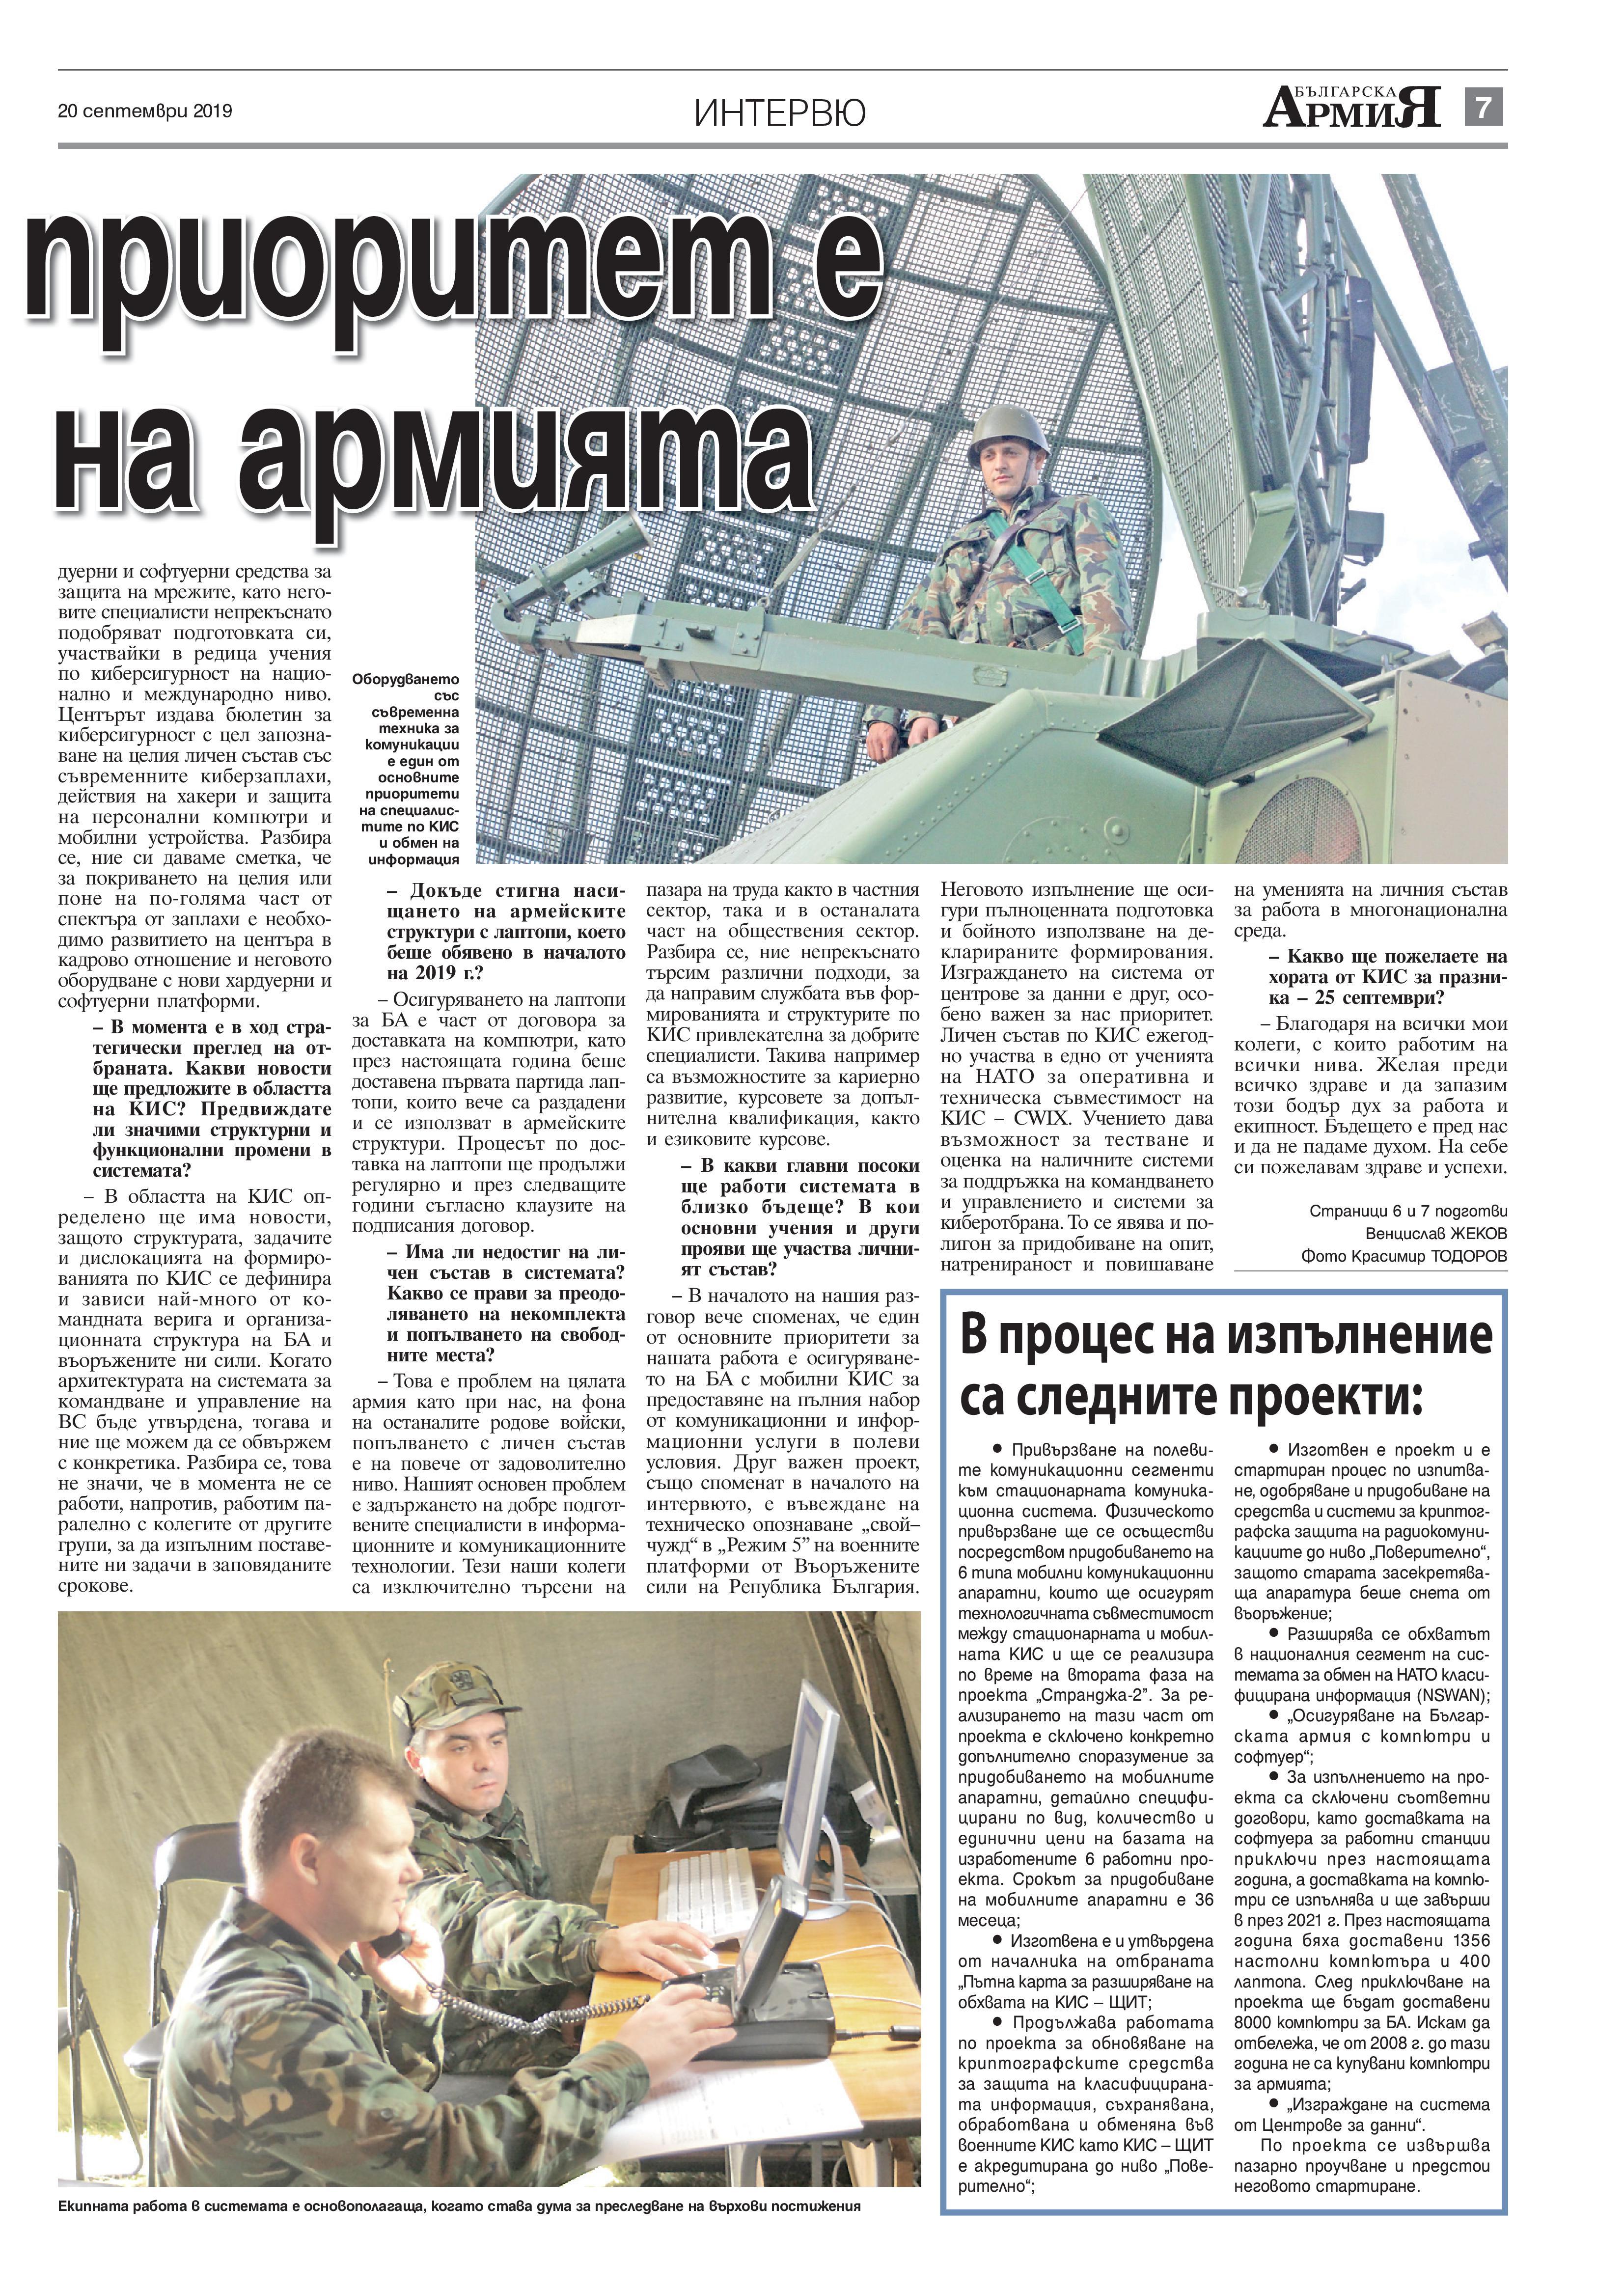 https://armymedia.bg/wp-content/uploads/2015/06/07-31.jpg